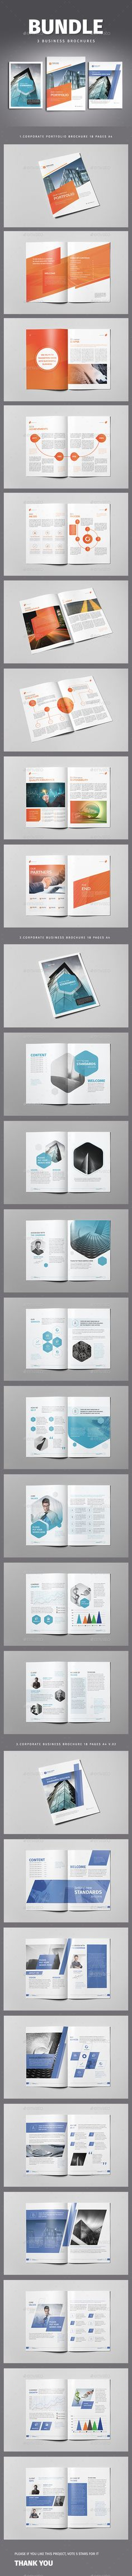 Brochure A4 Template InDesign INDD Bundle. Download here: http://graphicriver.net/item/brochure-a4-bundle-templates-for-indesign/14841946?ref=ksioks